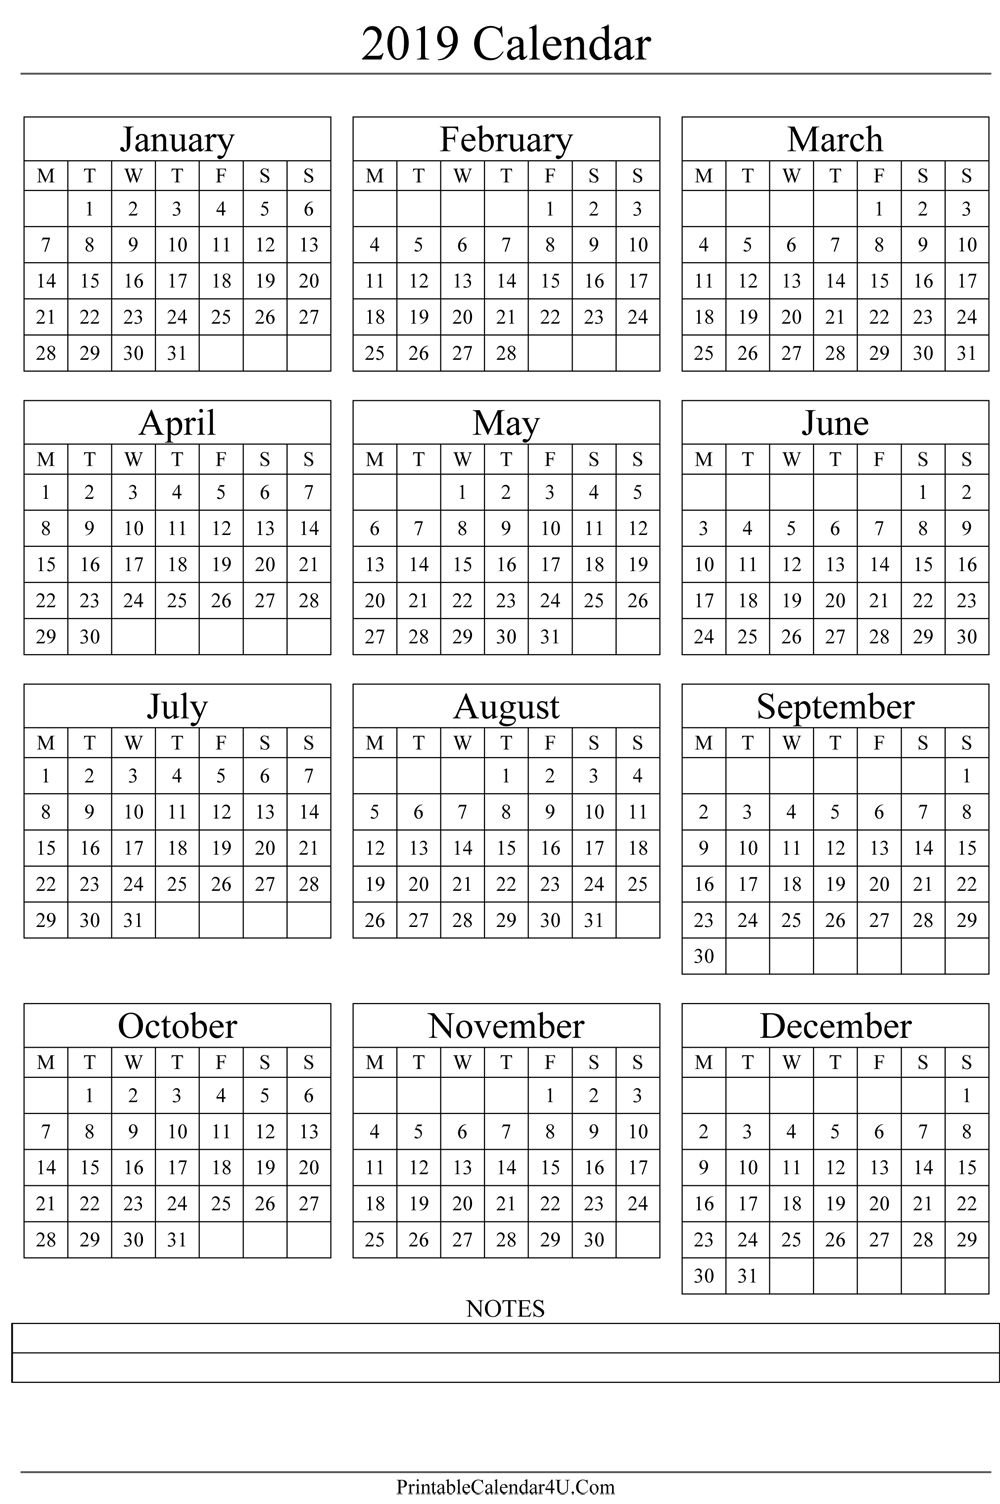 Annual Calendar 2019 Portrait Printable Calendar 2017 2018 2019 Calendar 2019 Annual